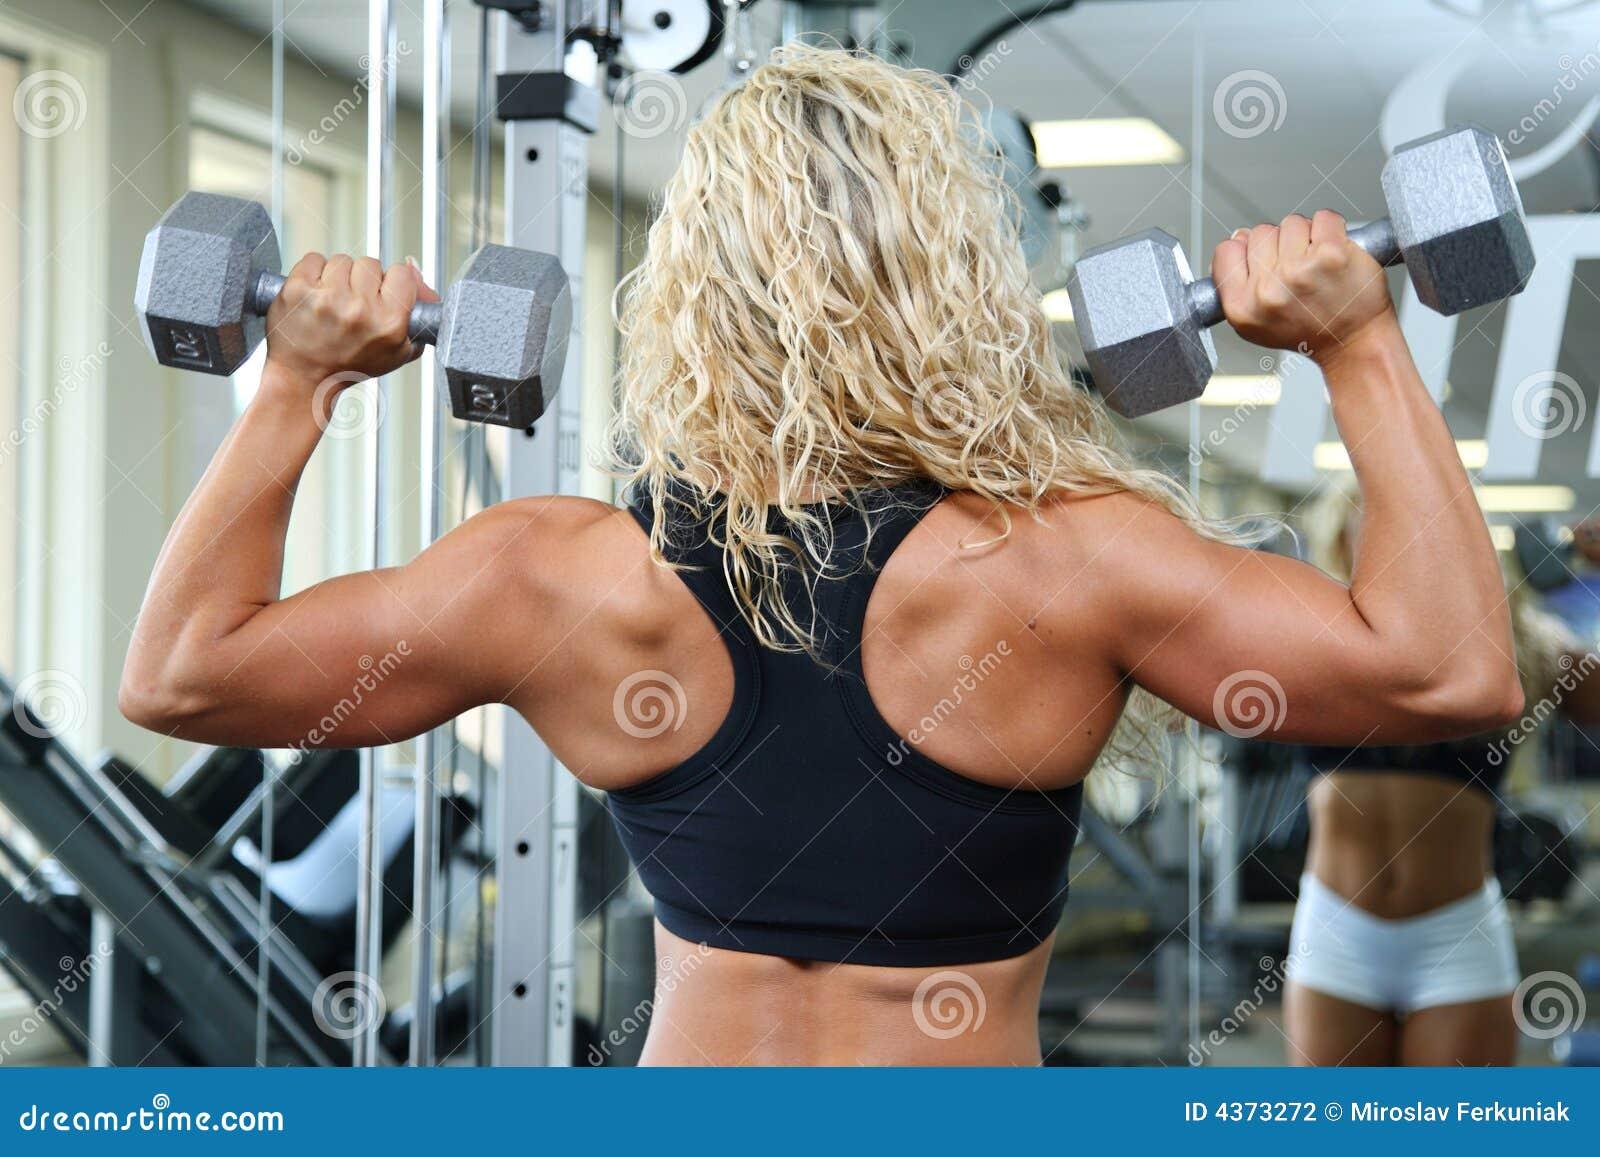 female bodybuilder thumbs